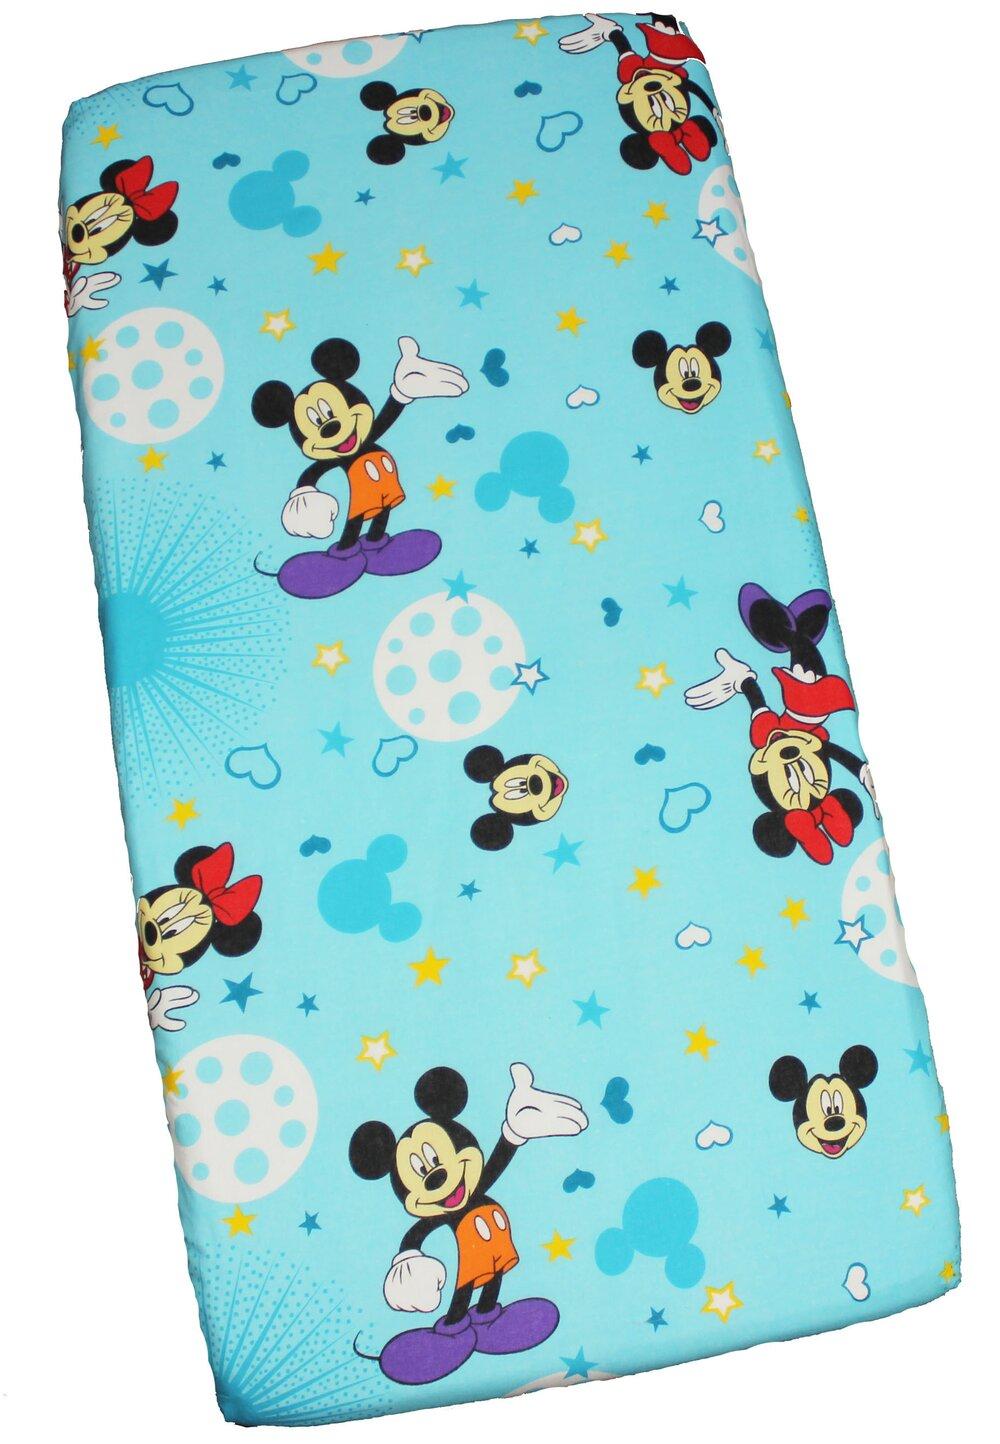 Cearceaf Minnie si Mickey, albastru cu stelute, 120 x 60 cm imagine